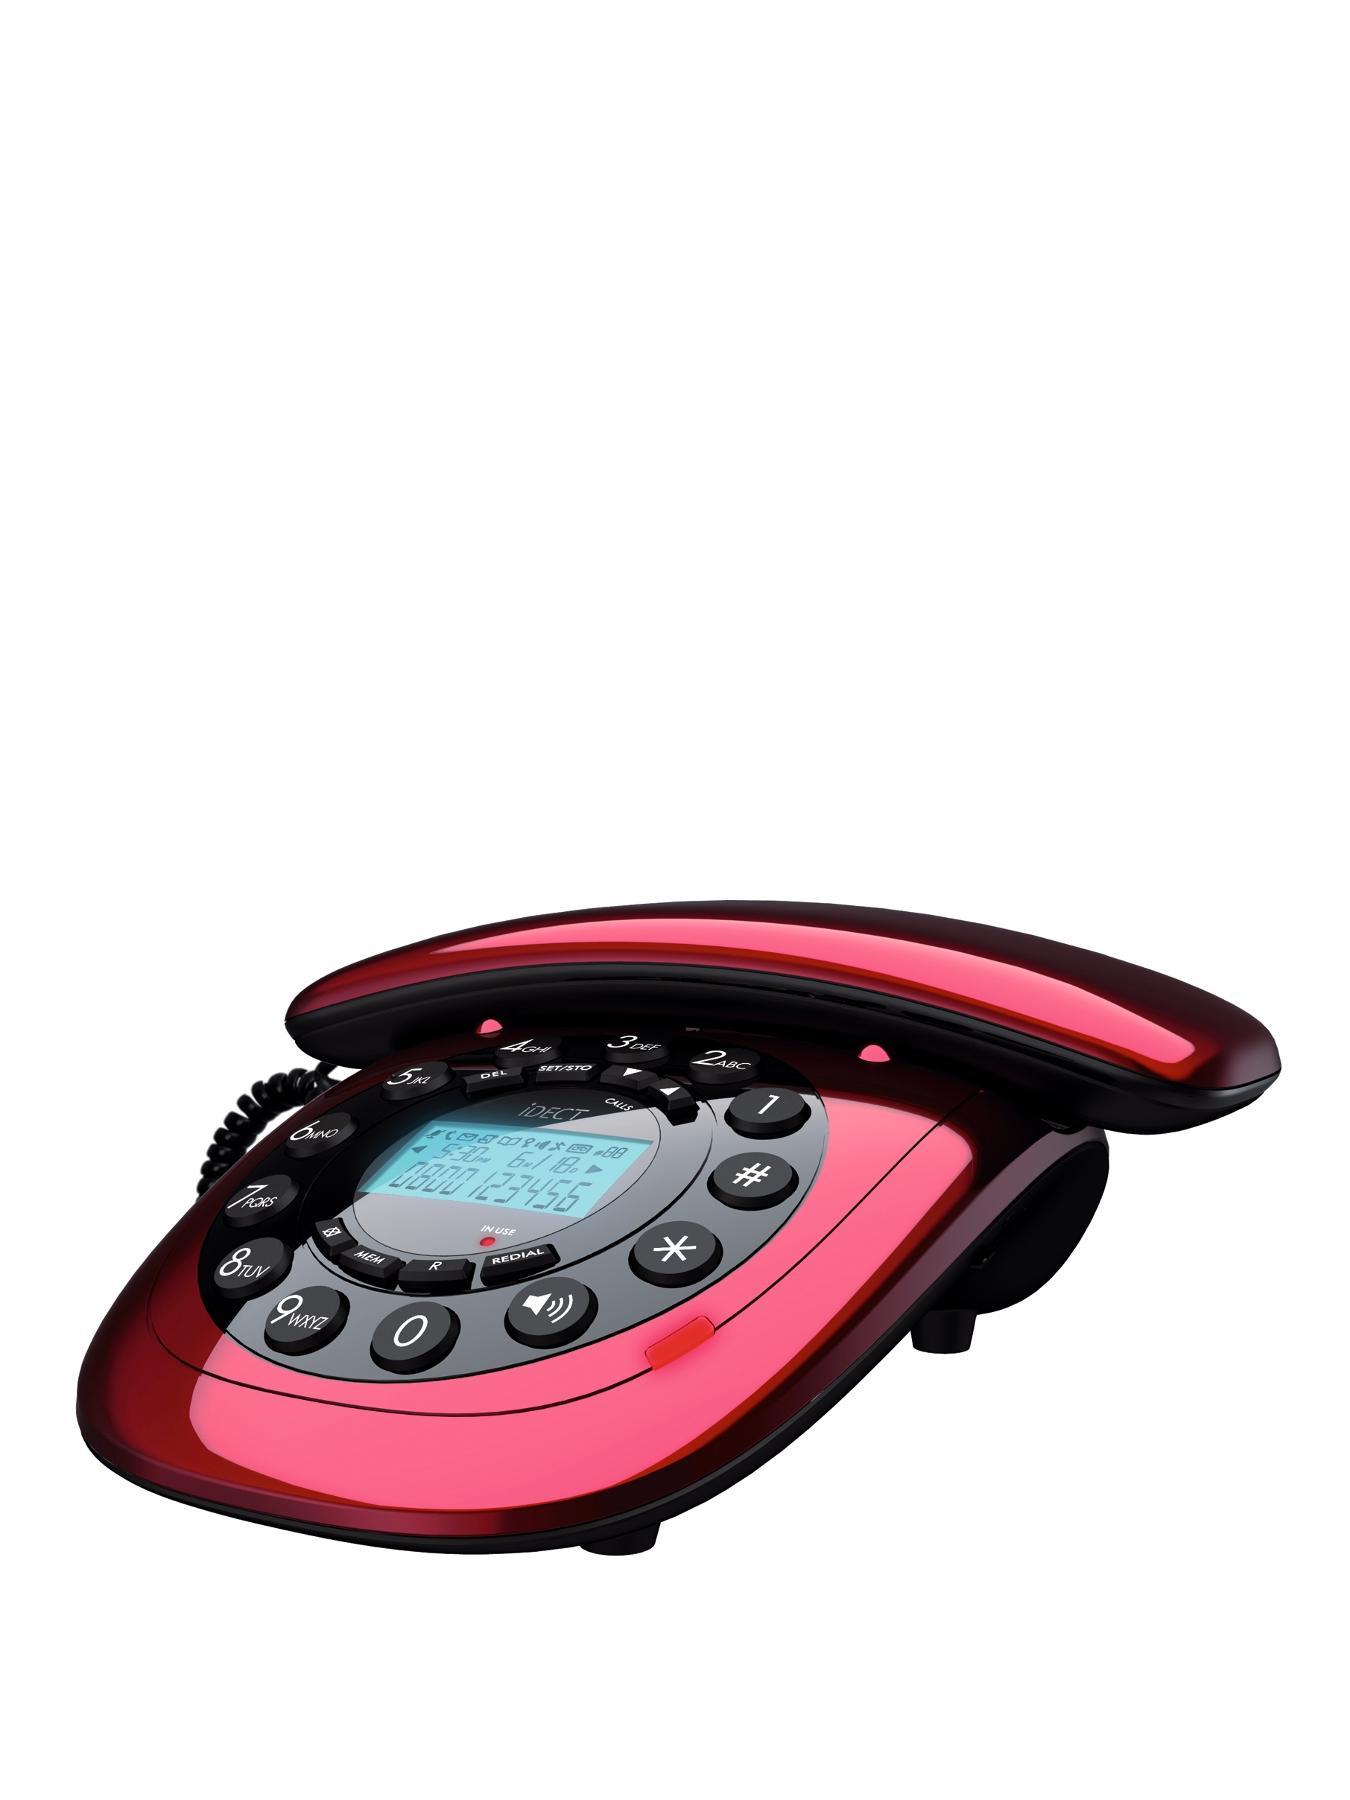 iDect Carrera Classic Corded Non Tam Phone